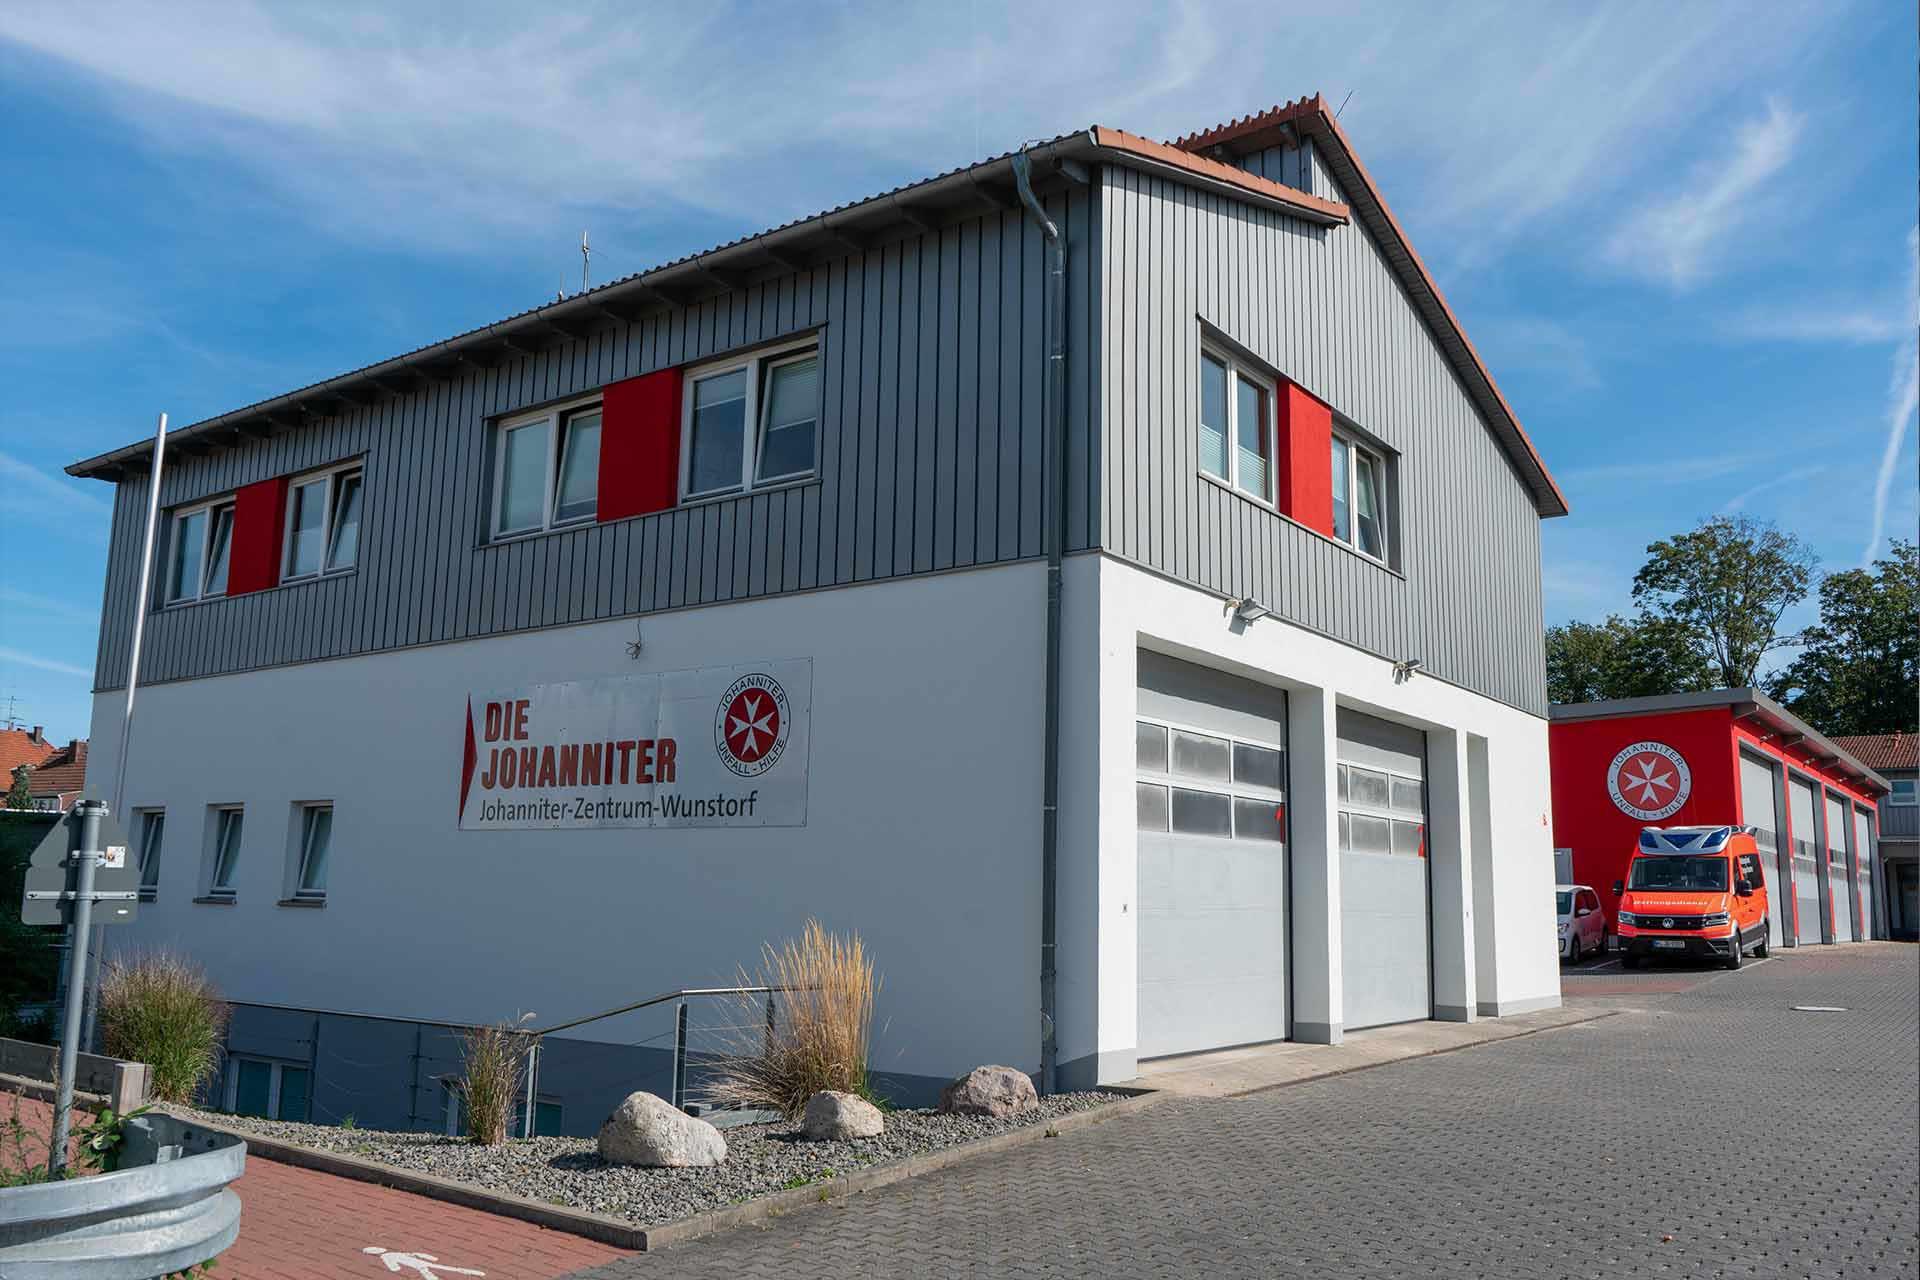 Johanniter-Rettungswache Wunstorf